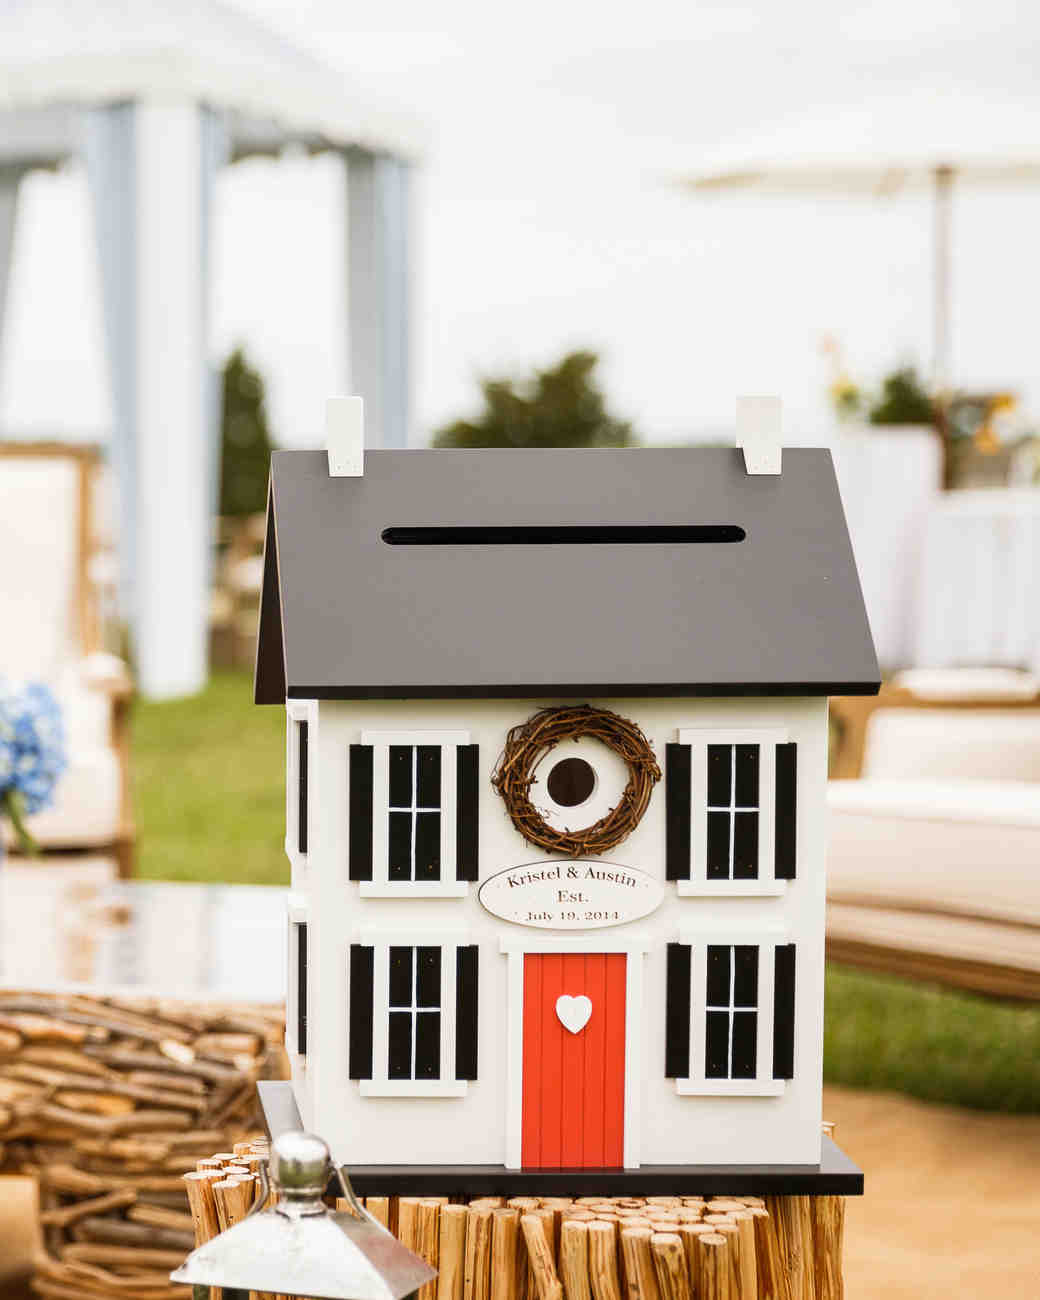 kristel-austin-wedding-cardbox-0851-s11860-0415.jpg